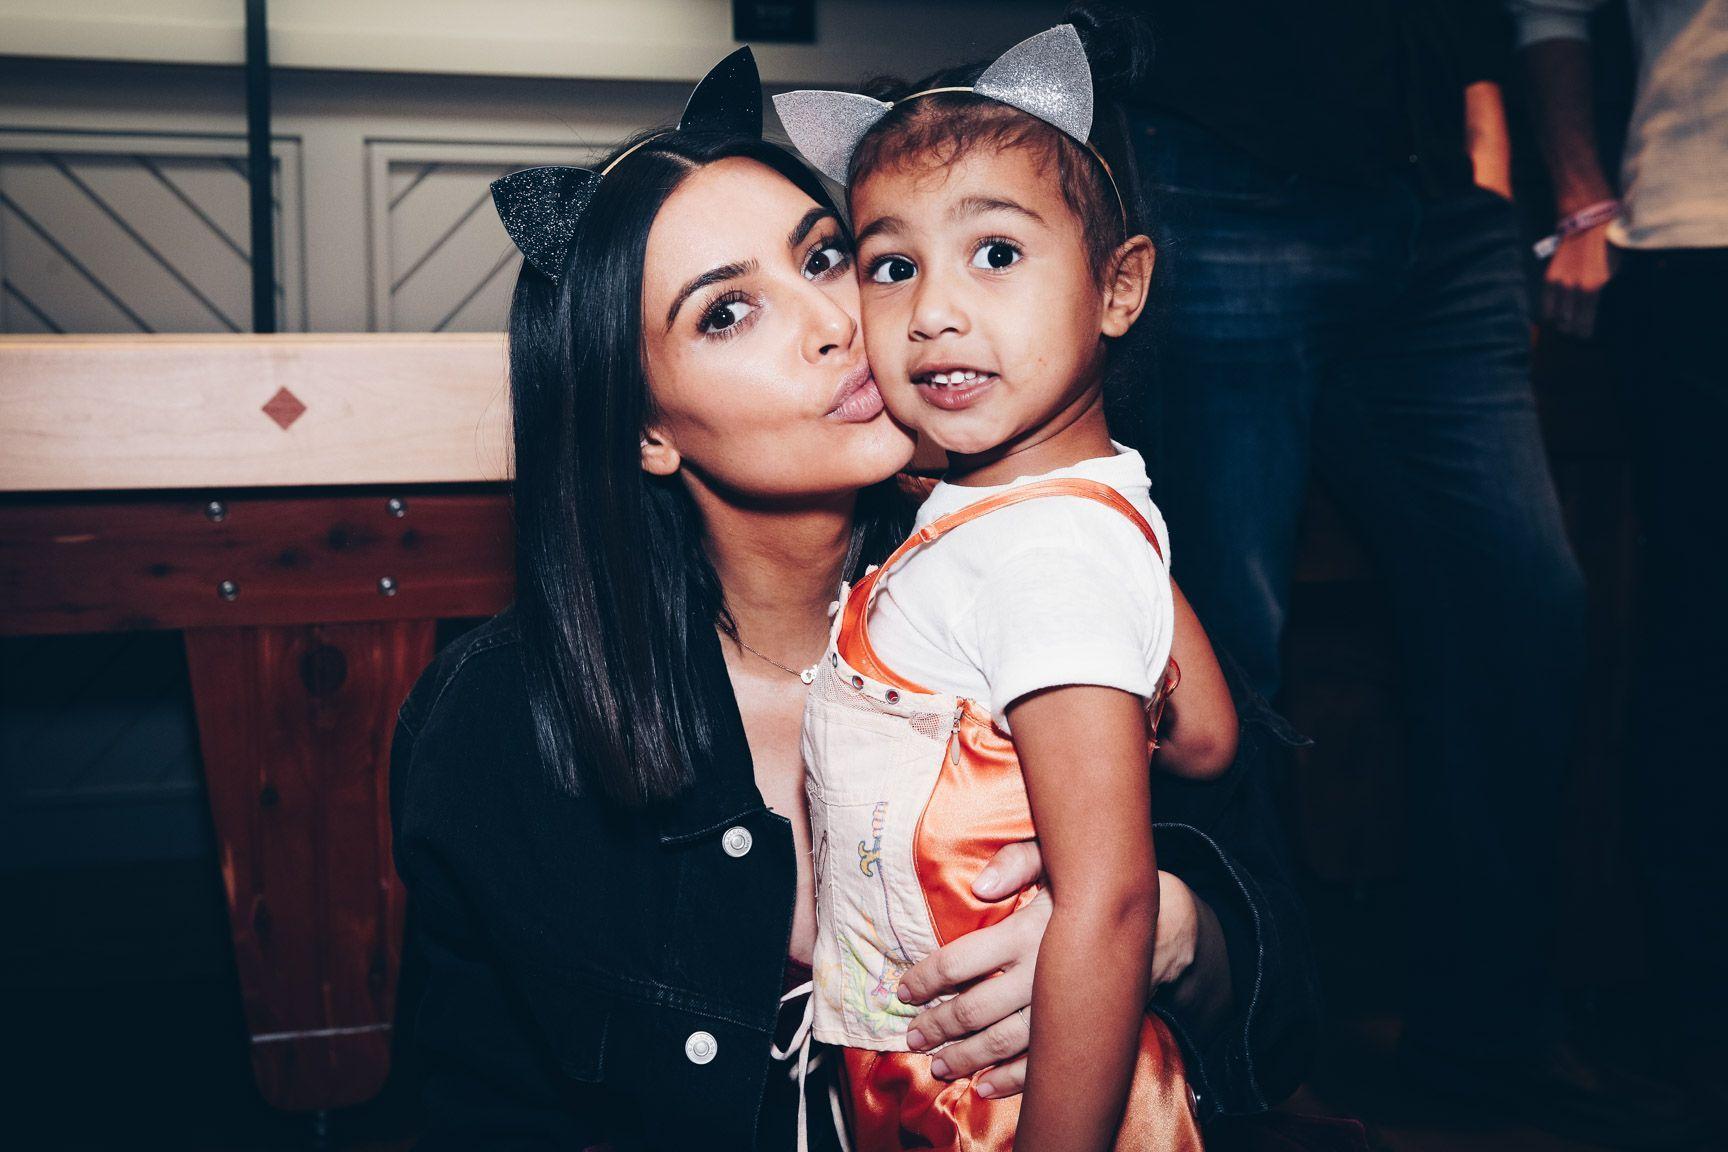 Thank North West for Giving Us Kim Kardashian's First TikTok